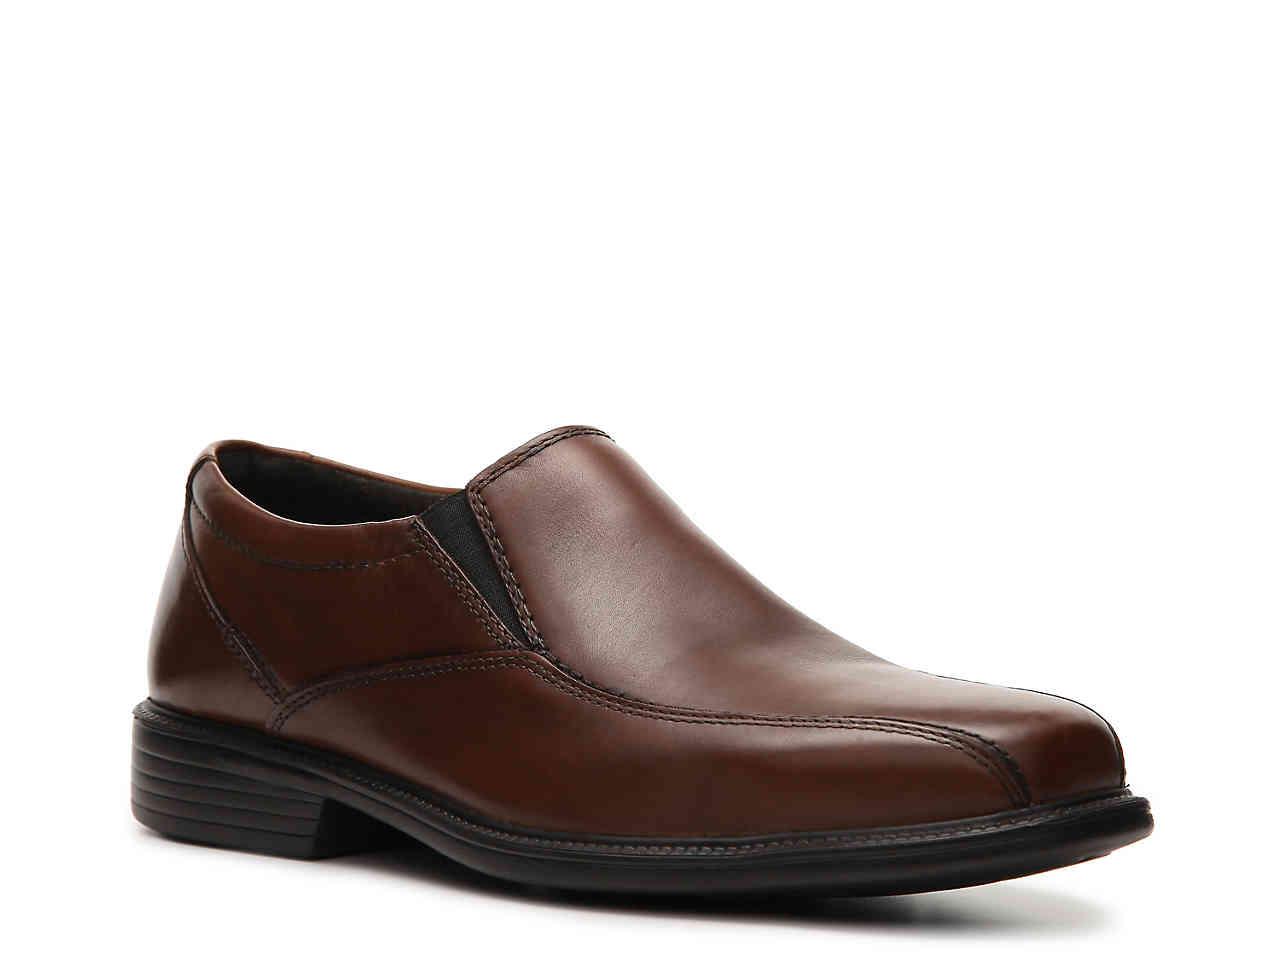 comfort shoes bolton slip-on kfybark